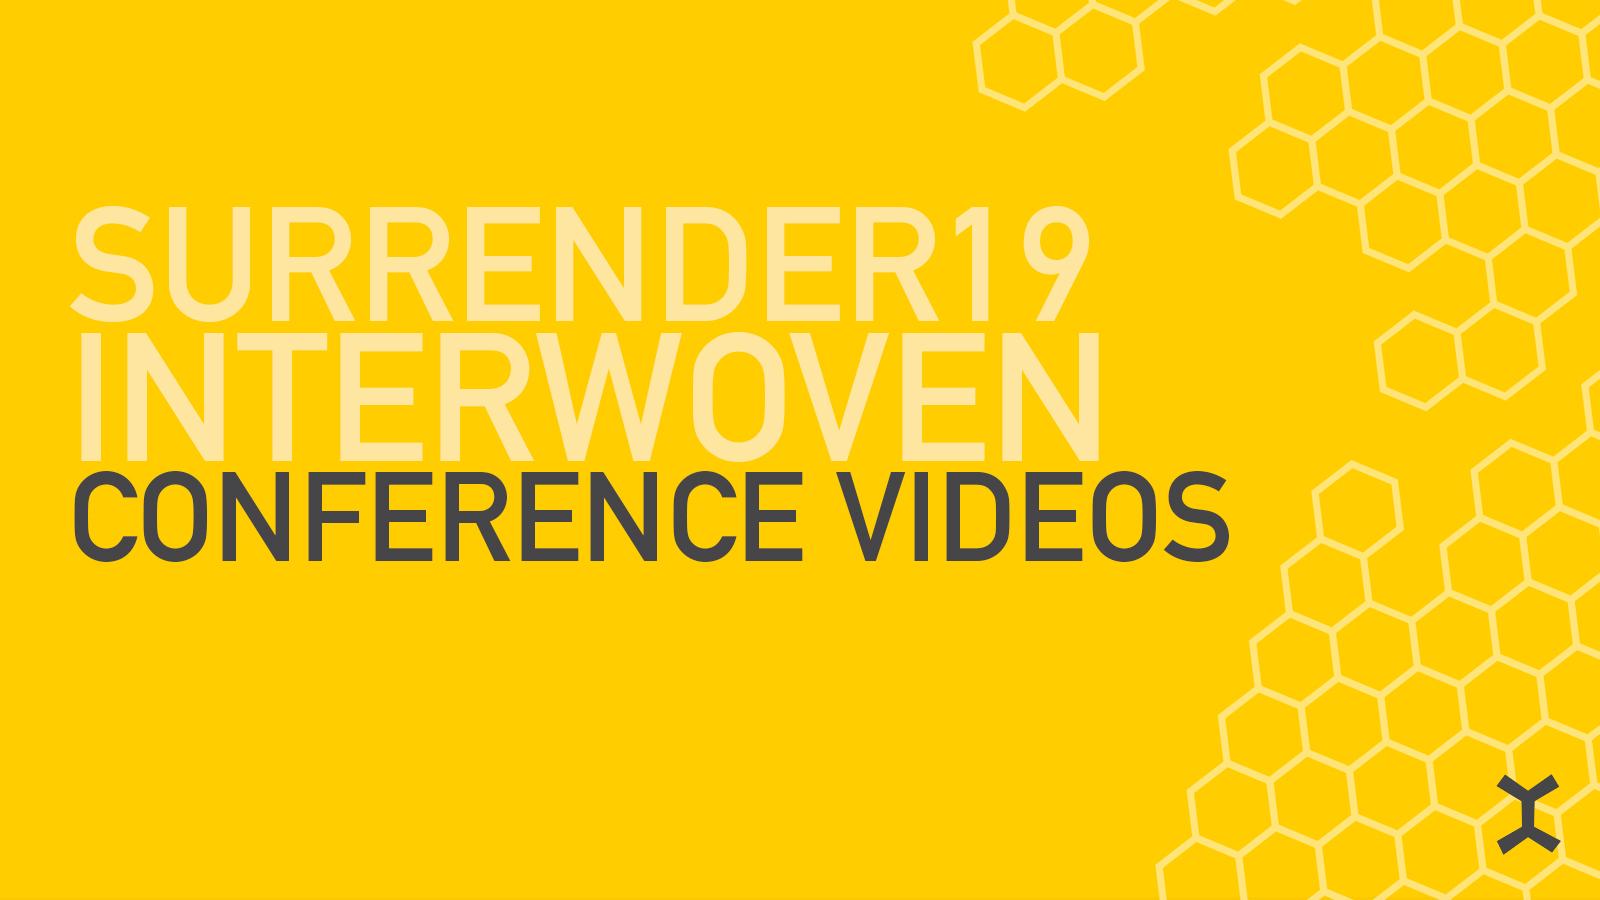 Conference videos.jpg